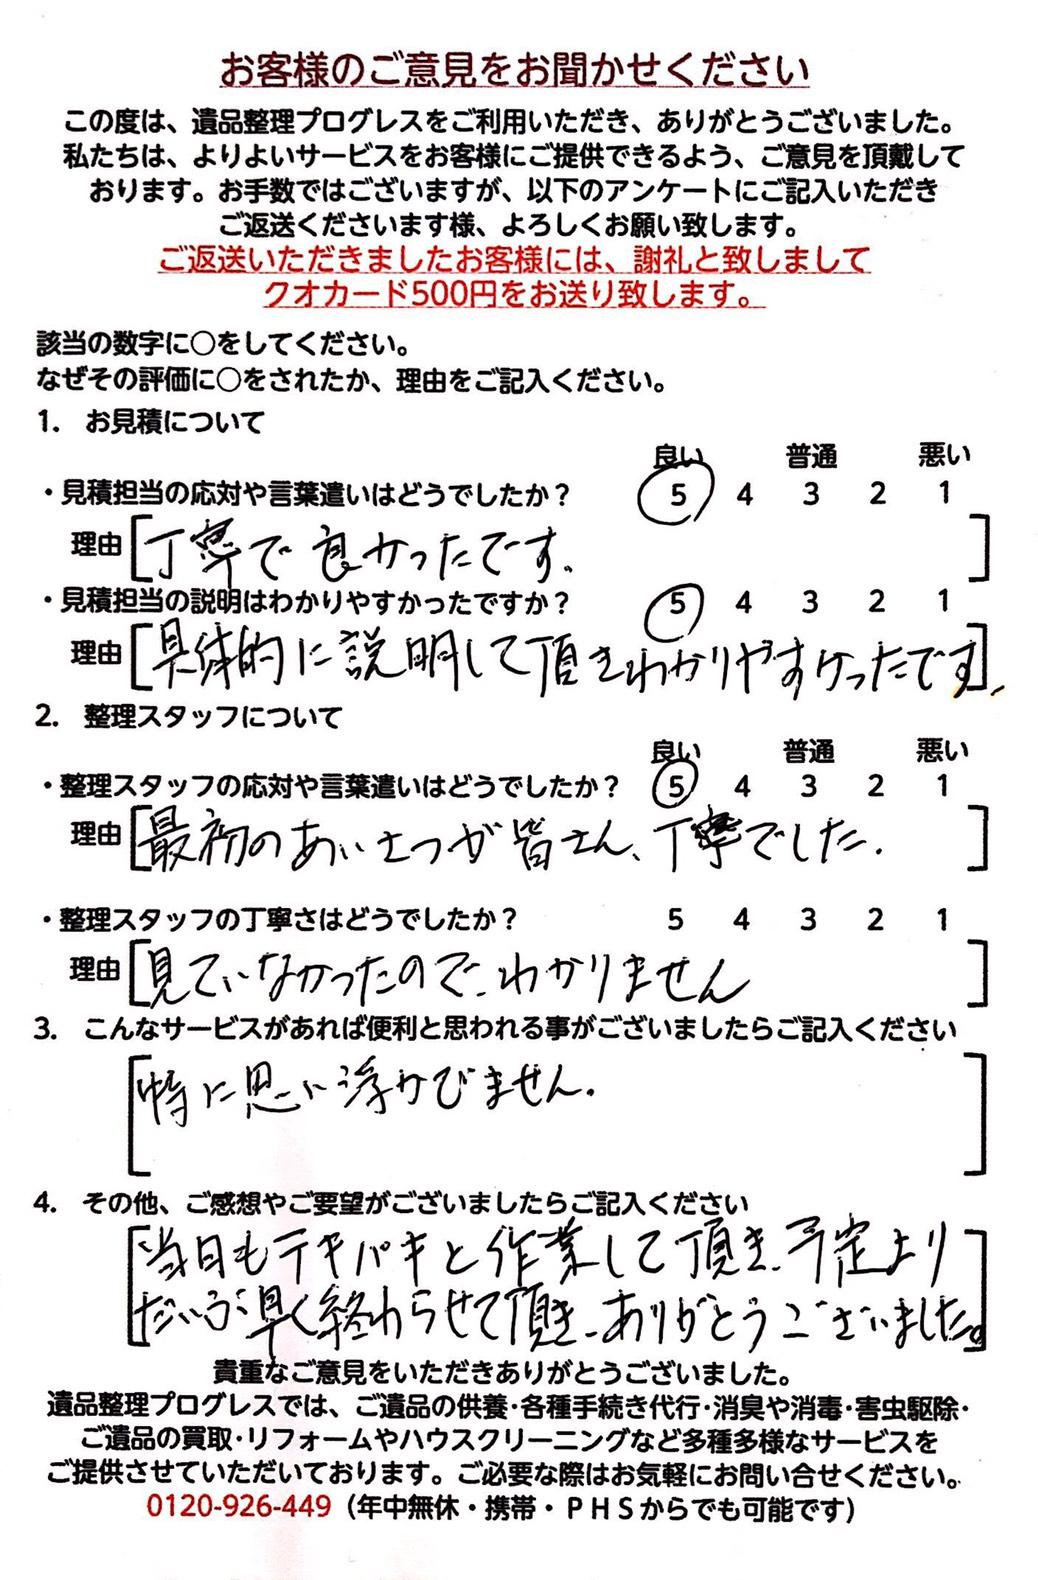 O・S様 千葉県我孫子市のアンケート用紙